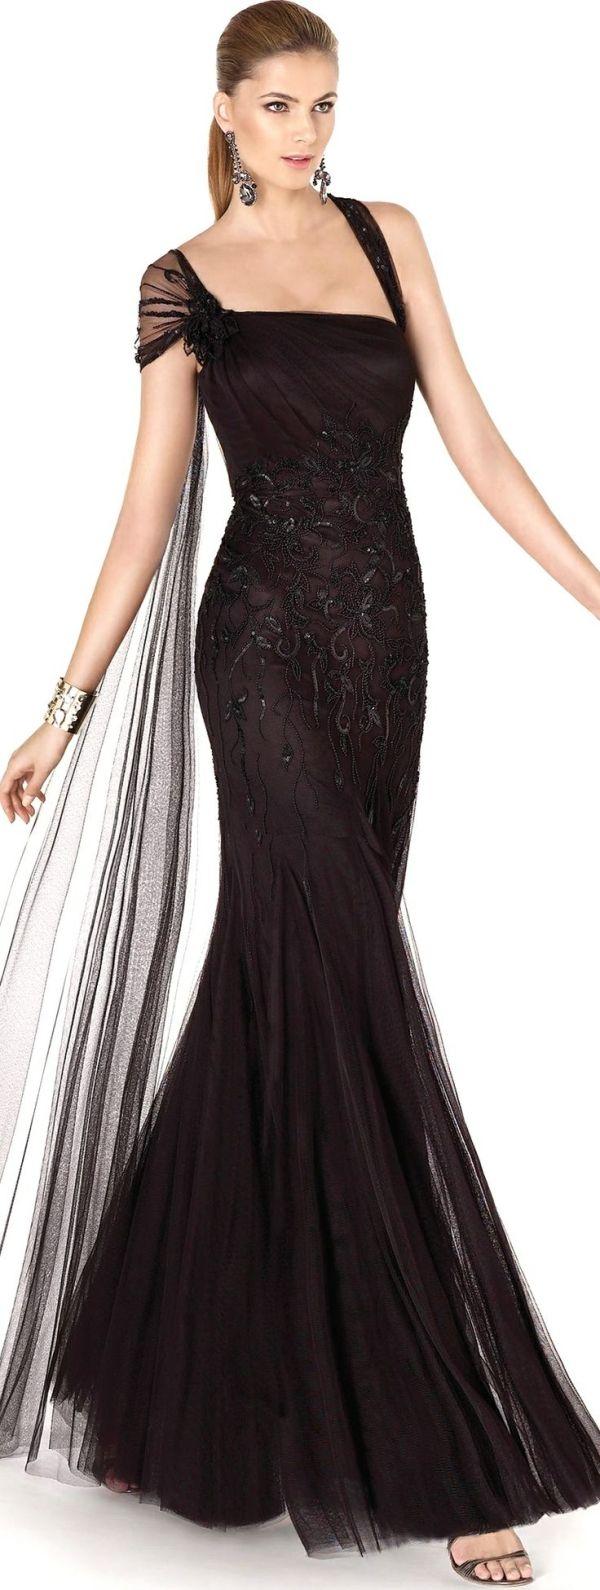 Vestido madrina pronovias 2015